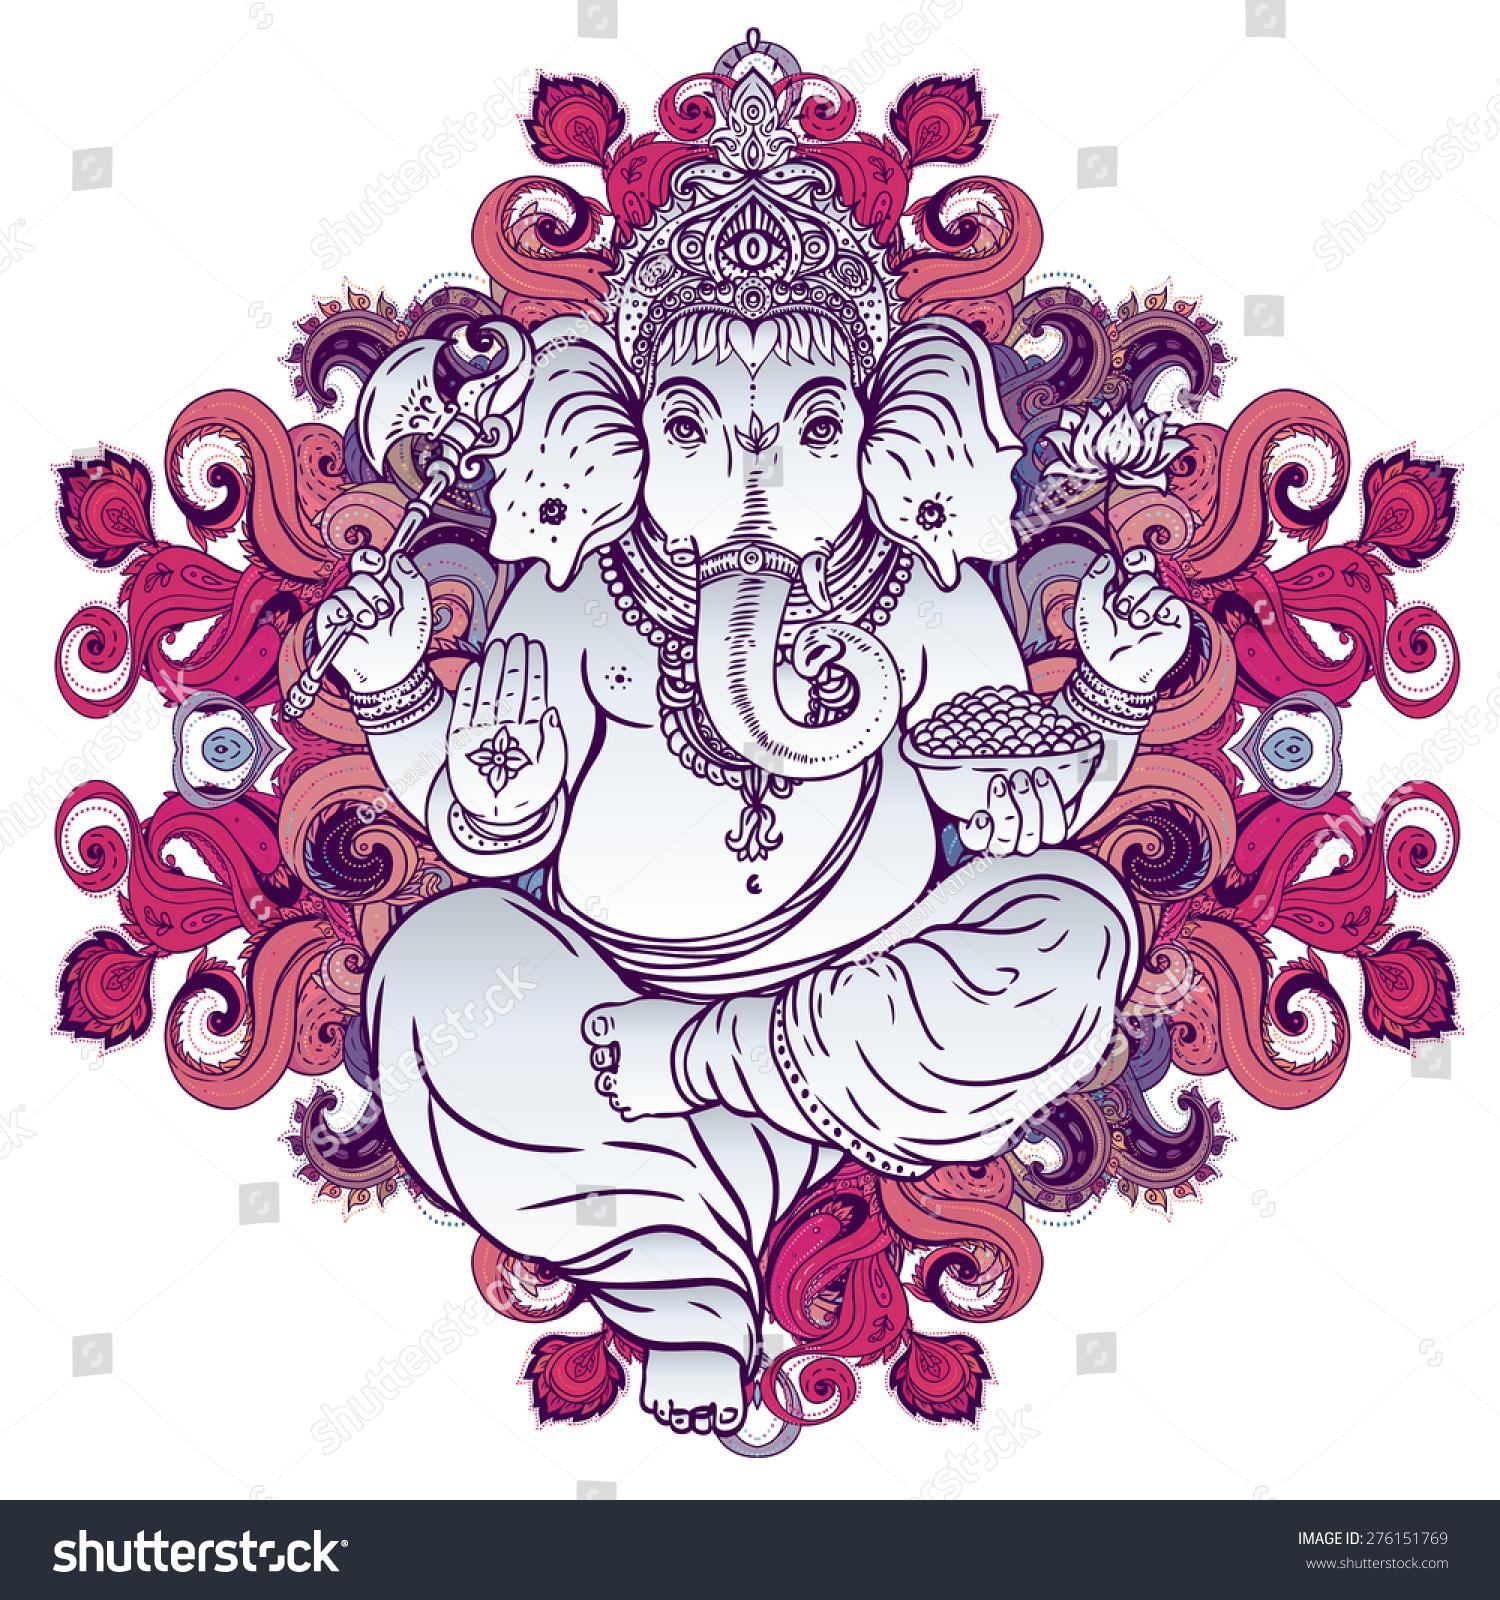 Hindu Lord Ganesha Over Ornate Colorful Stock Vector 276151769